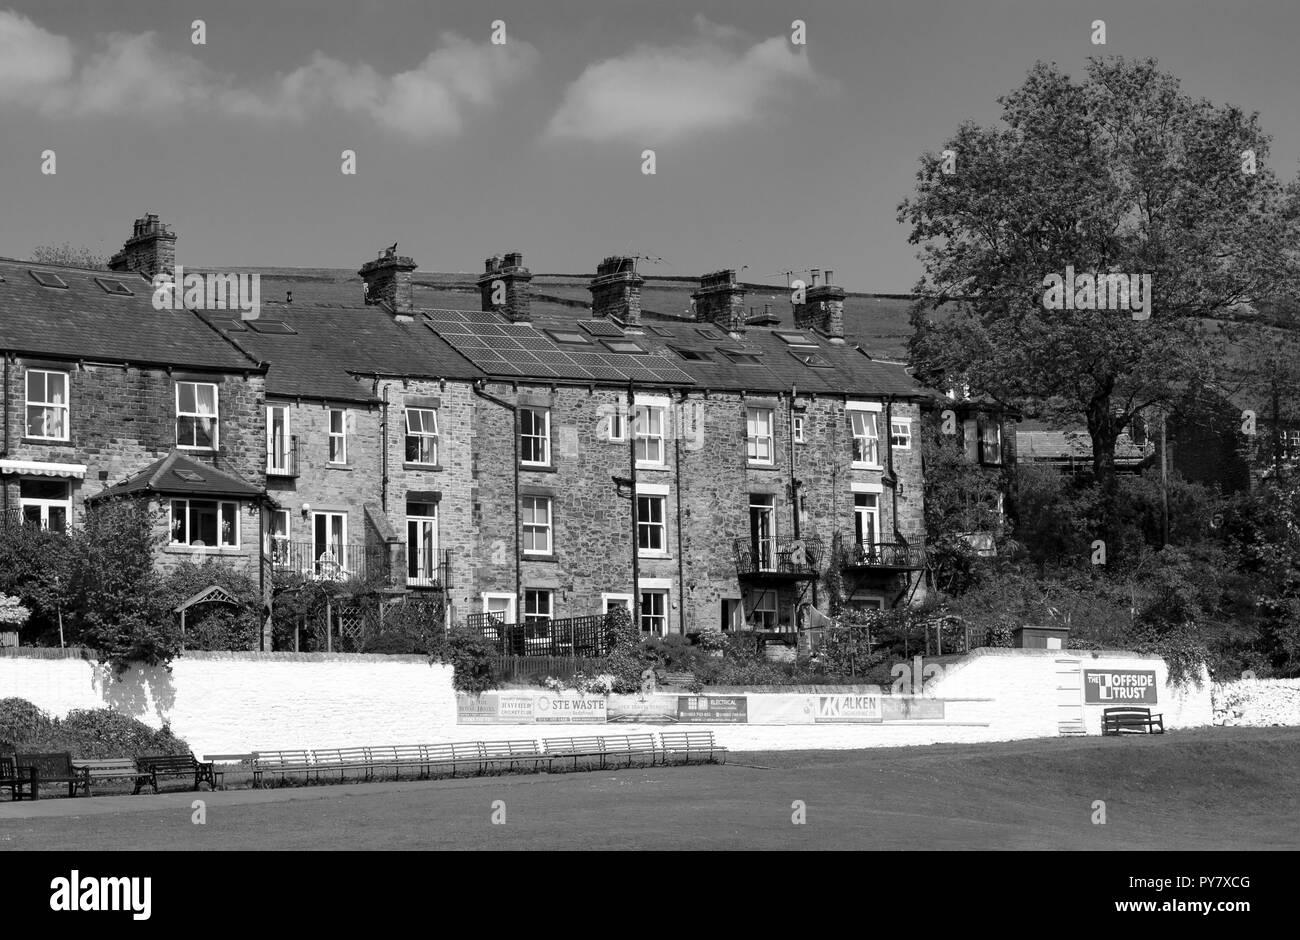 Hayfield Cottages, Derbyshire - Stock Image